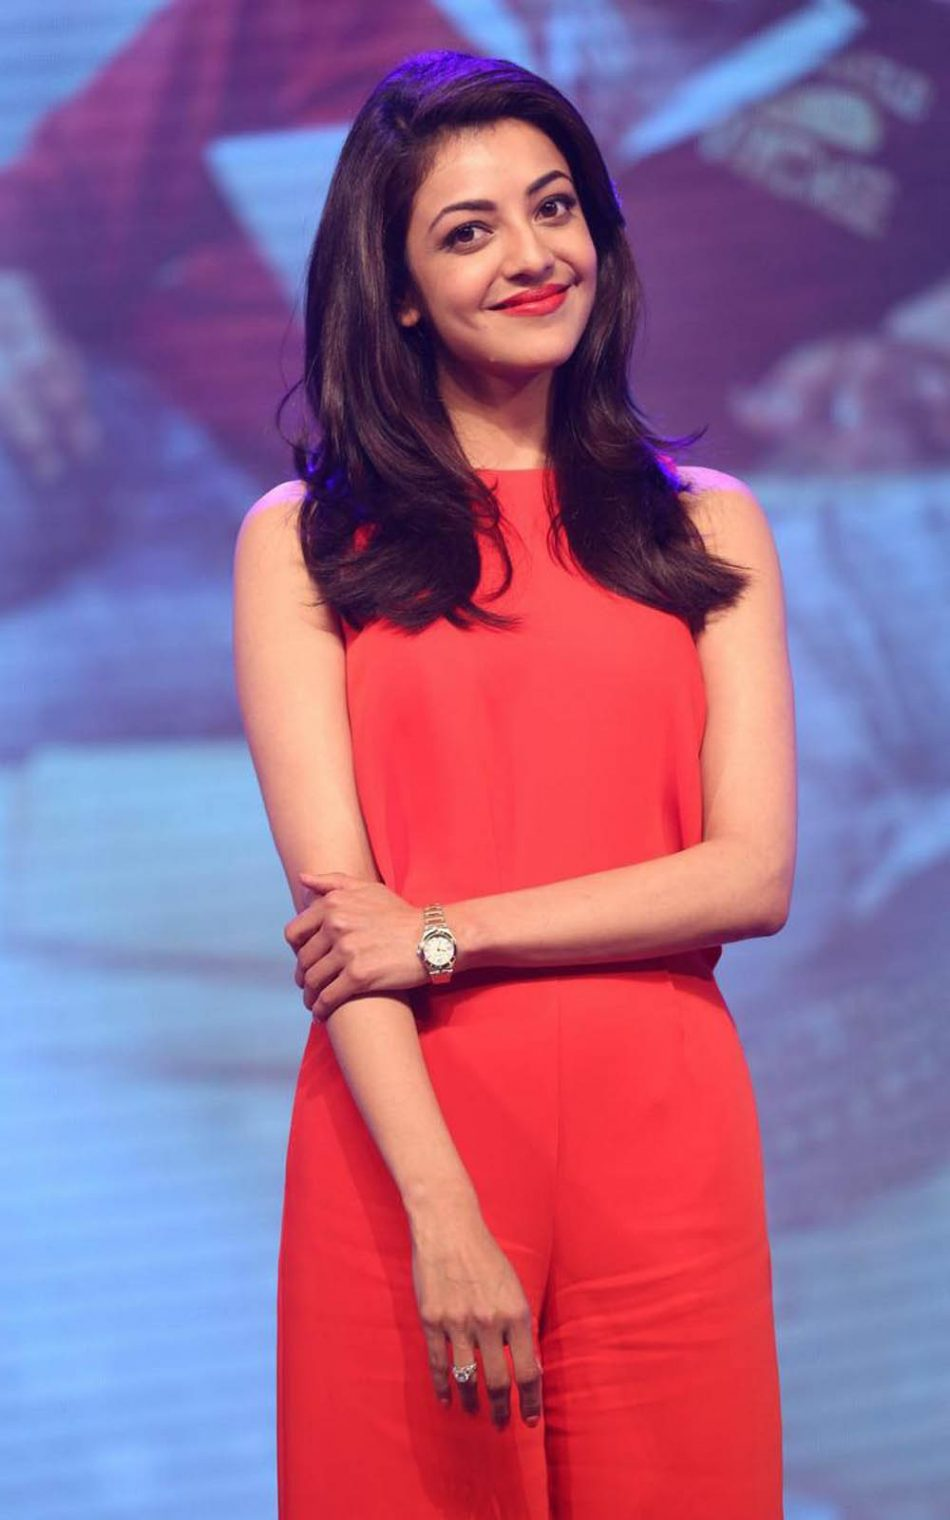 Kajal Agarwal In Red Dress Hd Mobile Wallpaper - Kajal Agarwal Wallpapers For Mobile , HD Wallpaper & Backgrounds